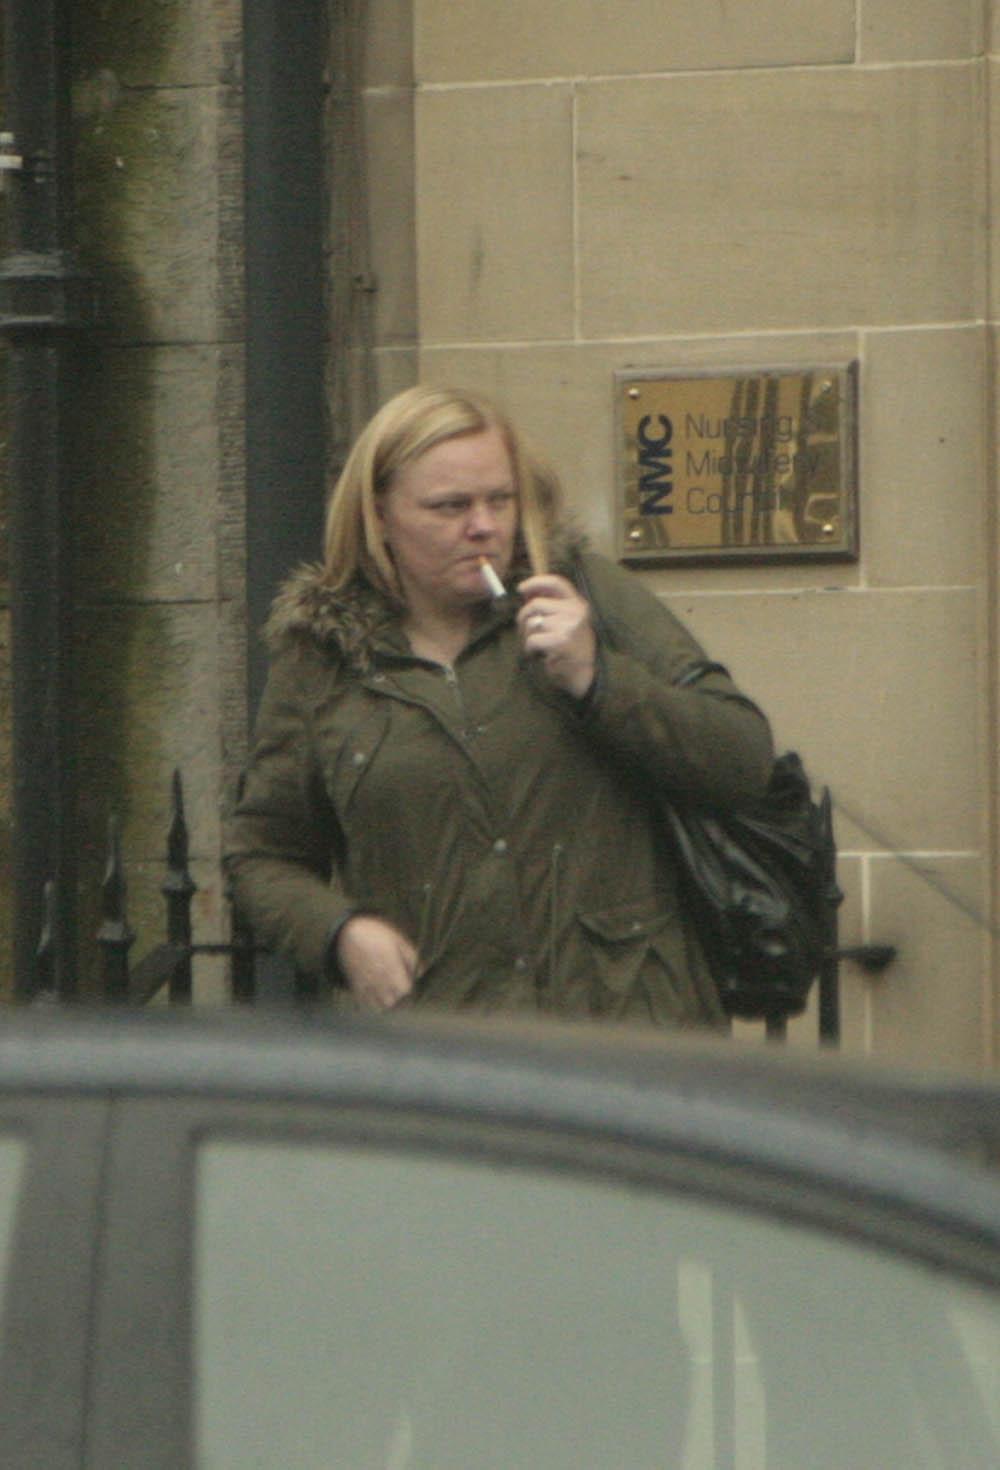 Alison Cochrane smoking